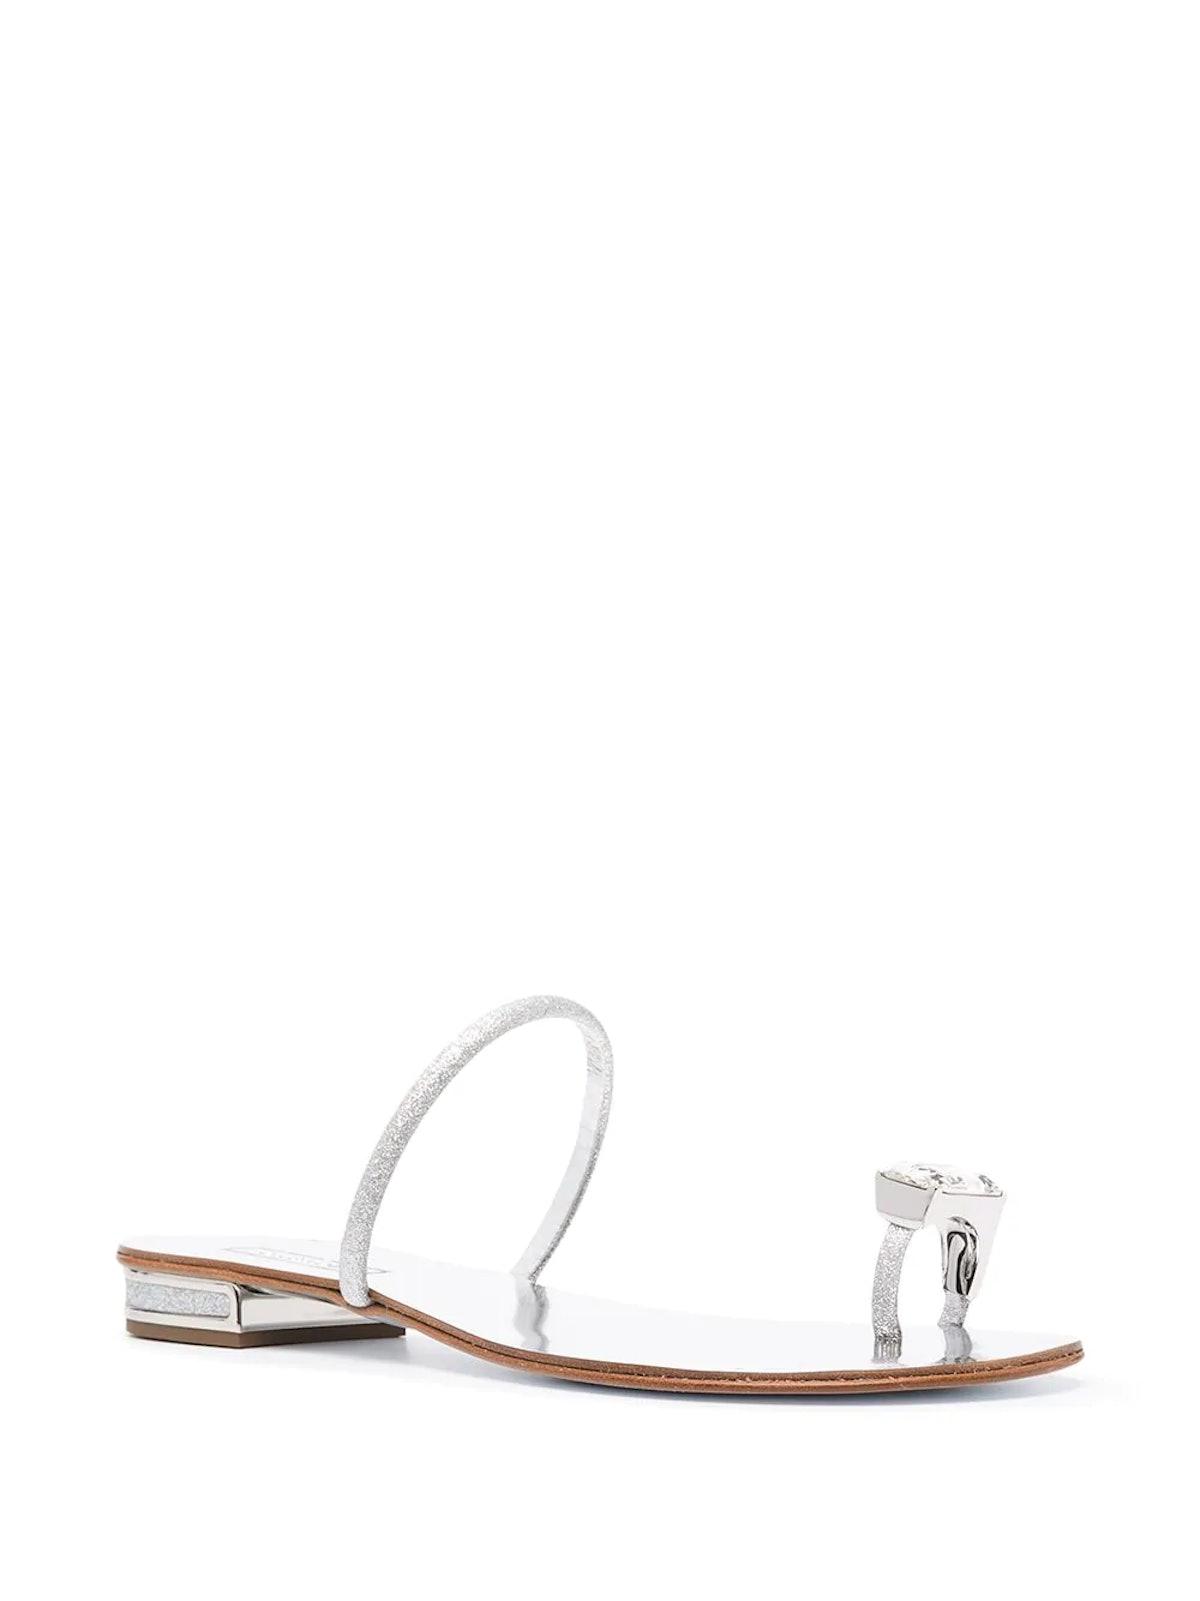 Crystal Toe Strap Sandals